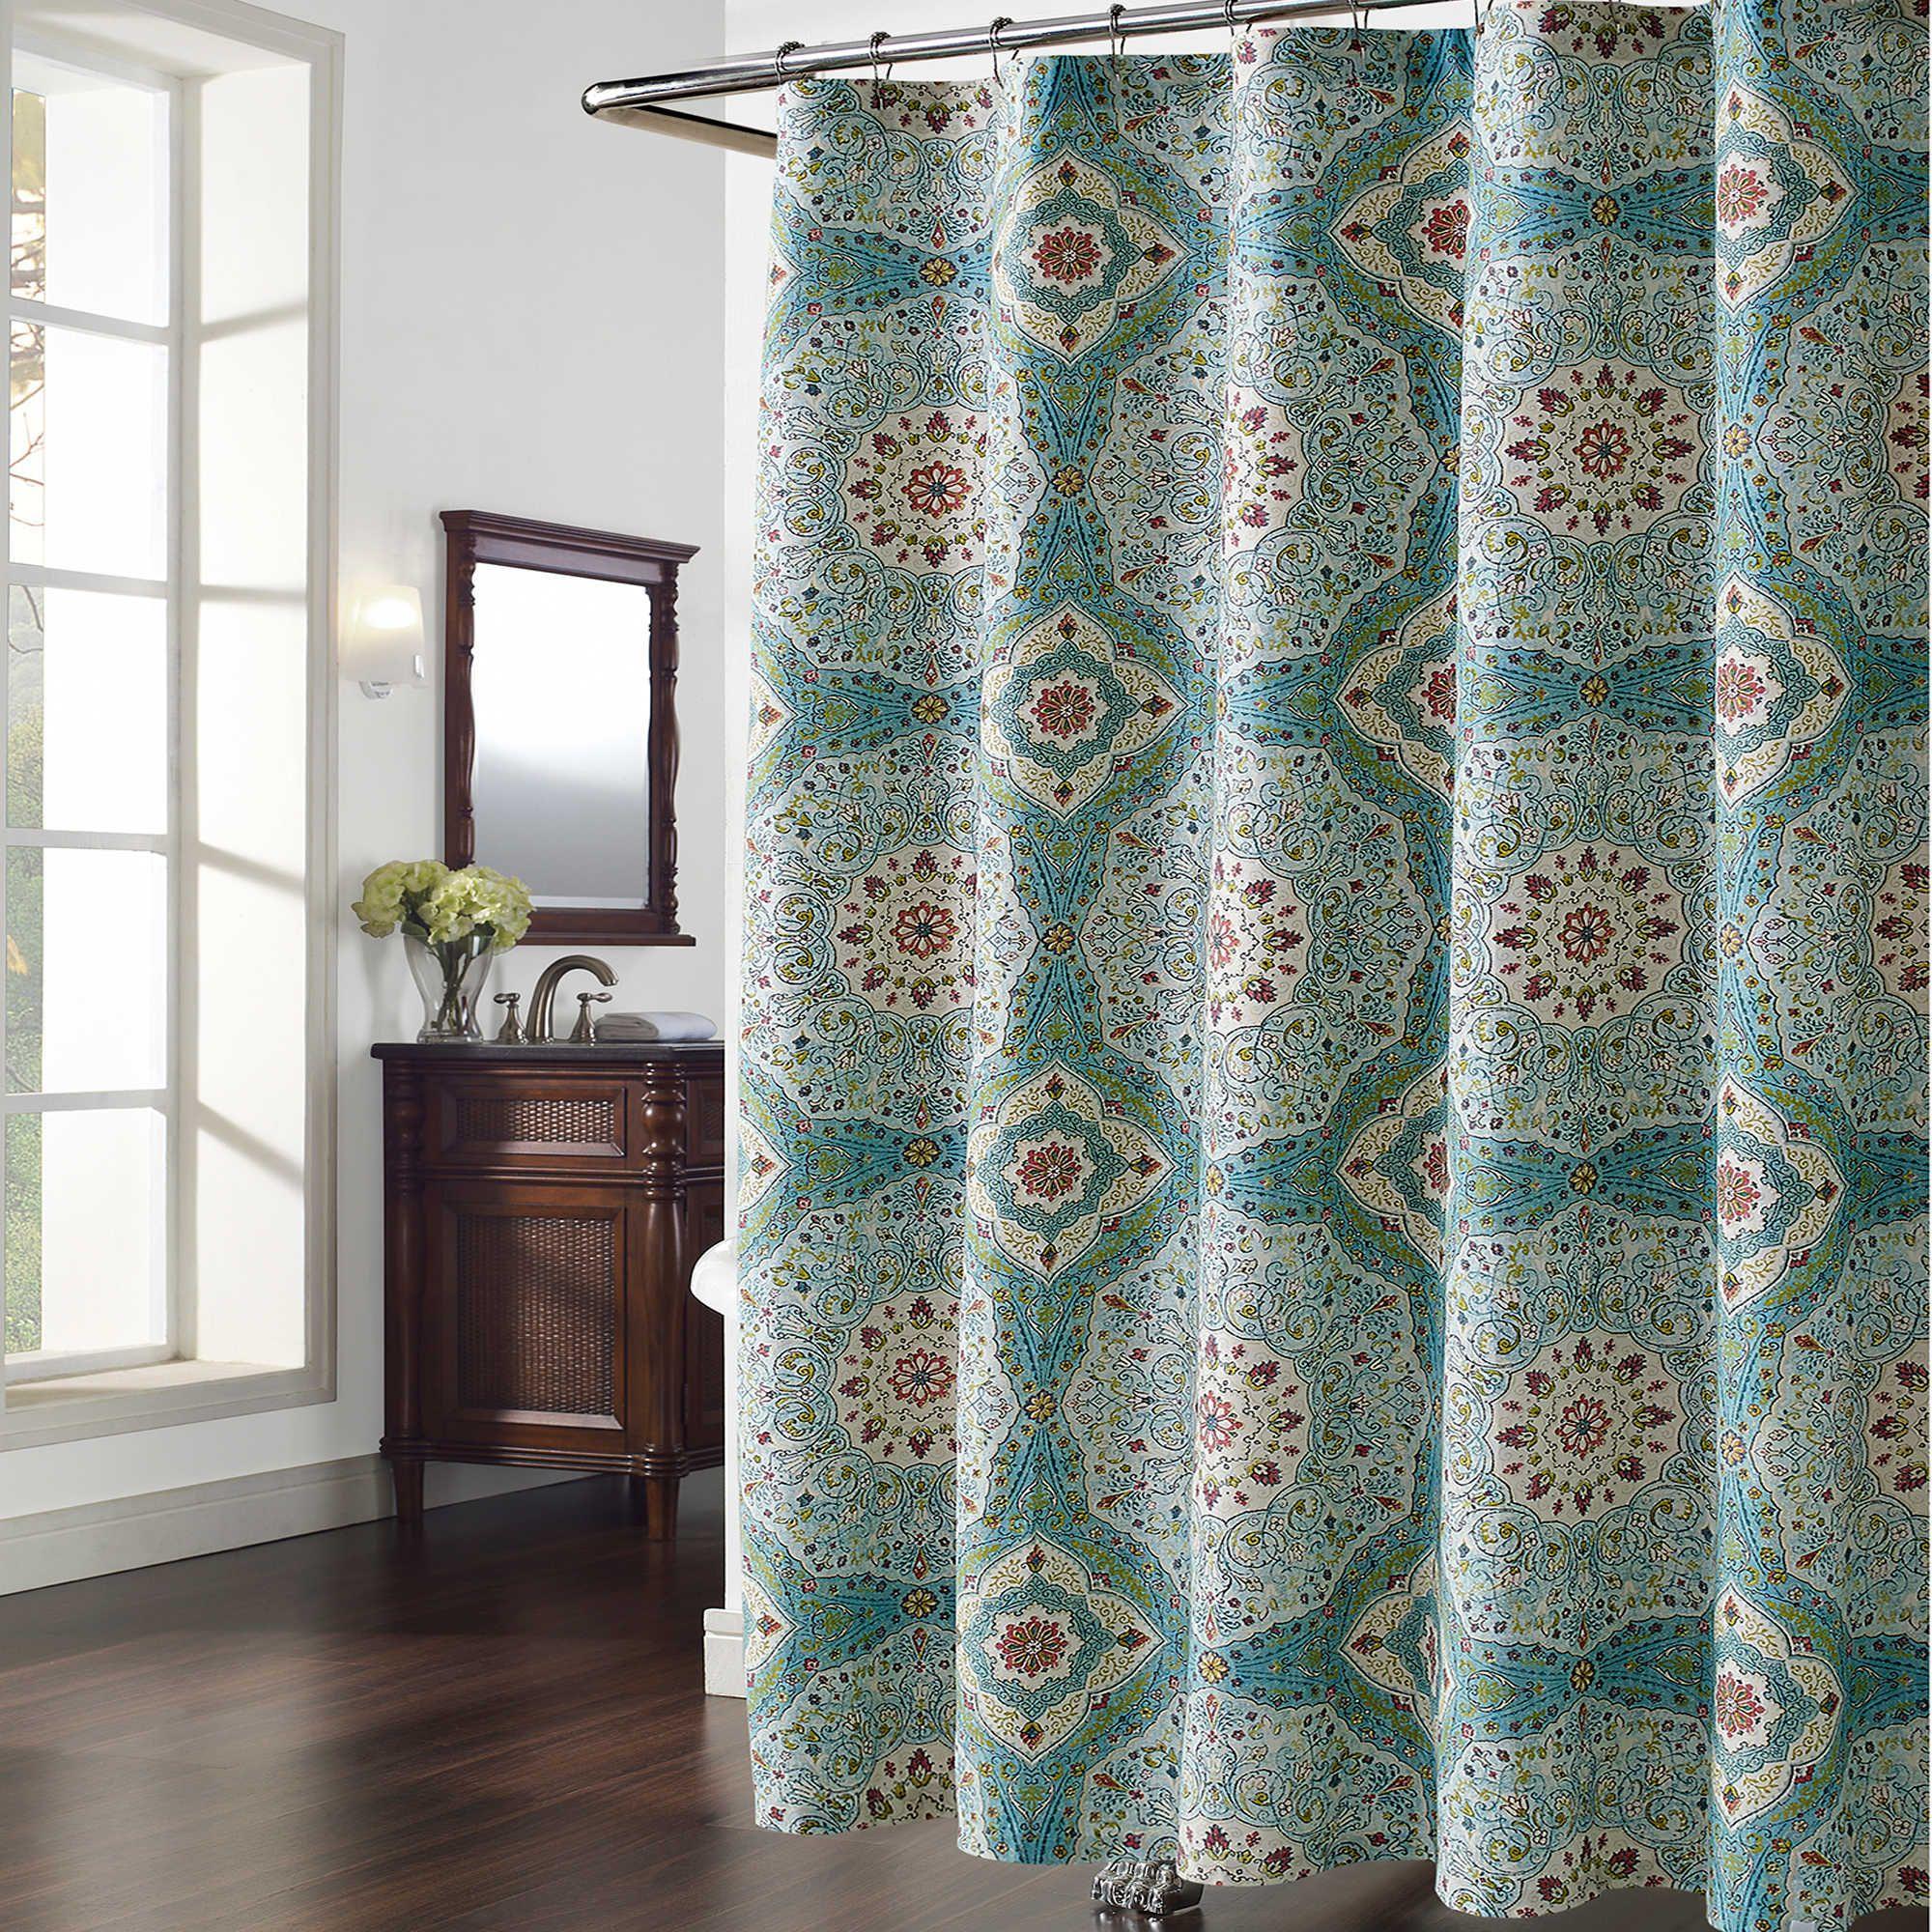 $24.99 Bed Bath & Beyond Mandala Shower Curtain | Bathroom Remodel ...